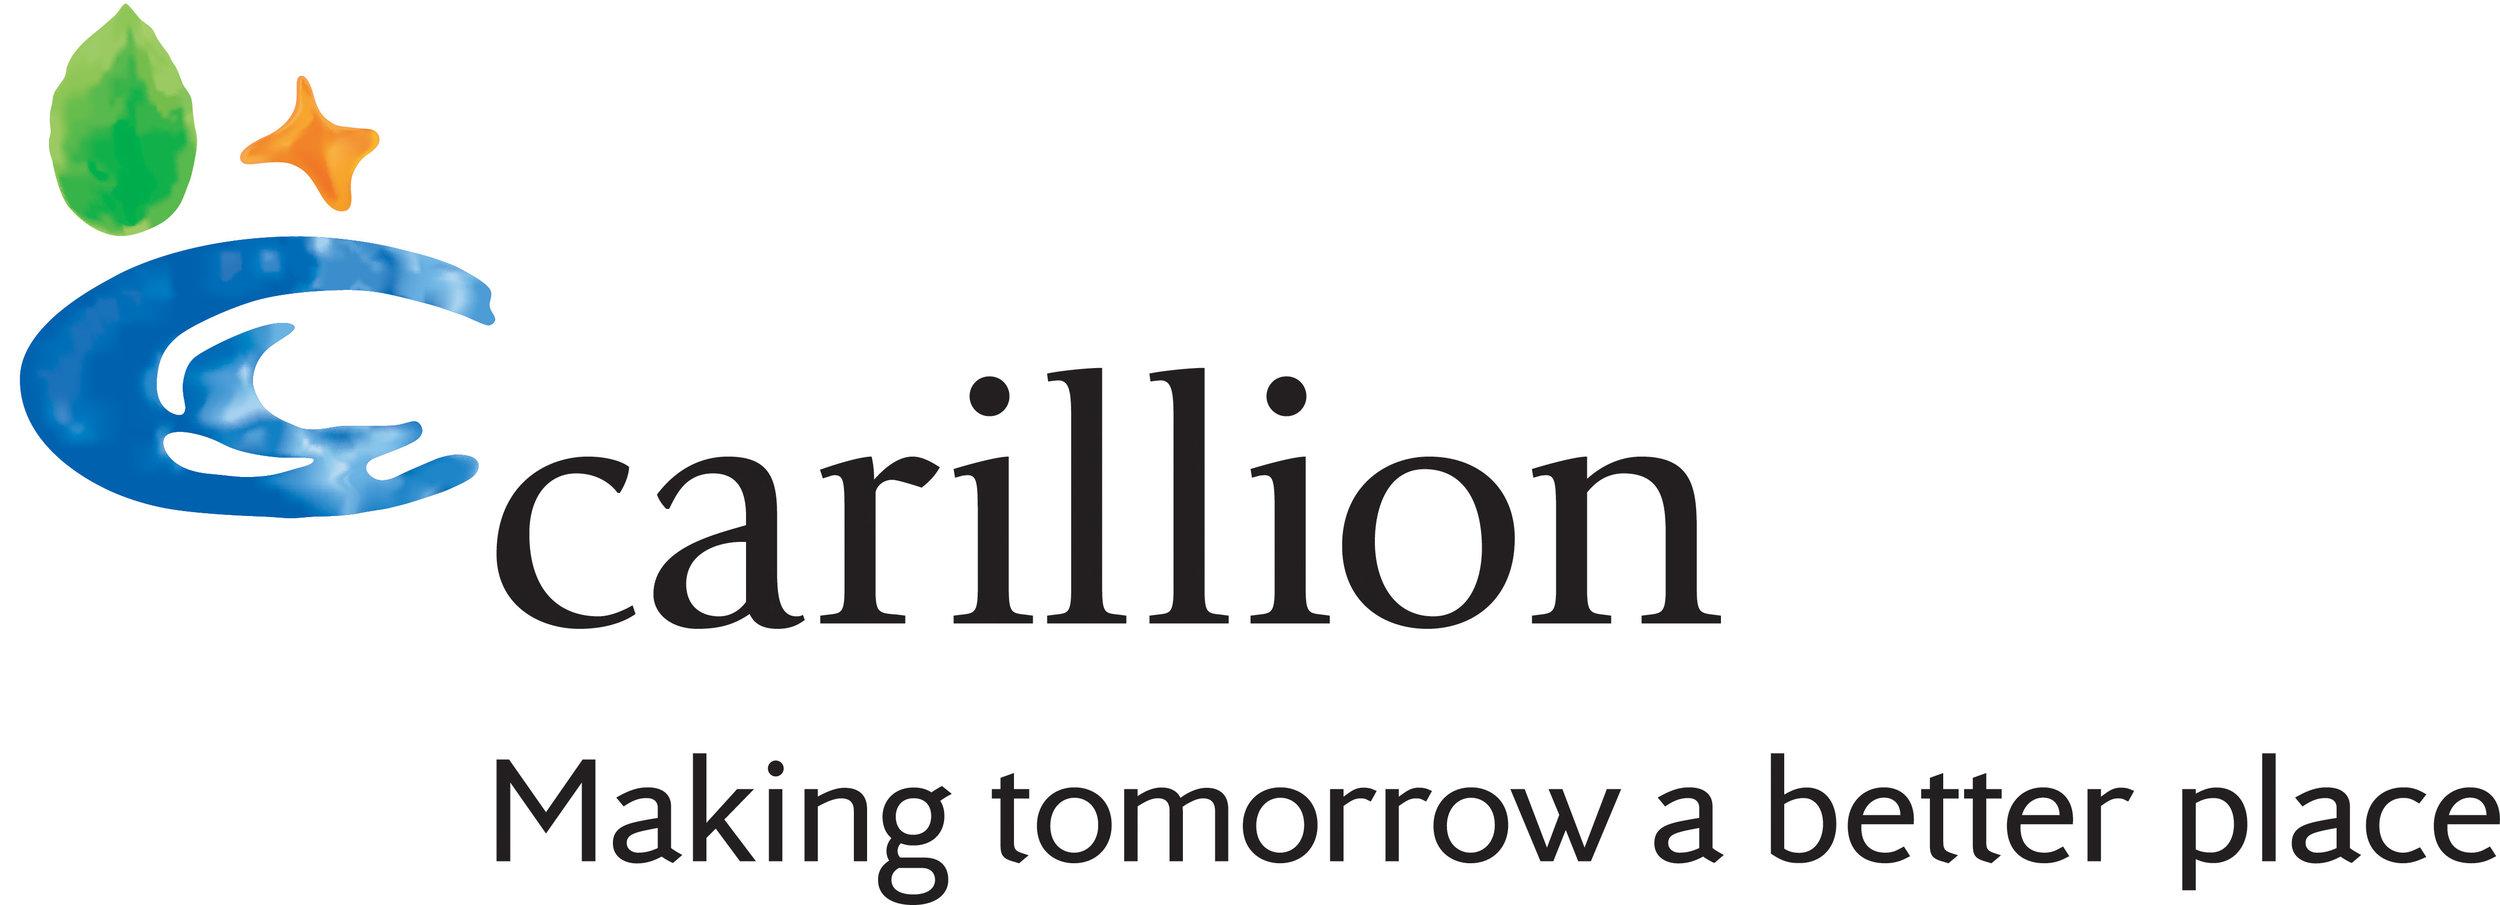 carillion_logo-Colour-Strapline.jpg